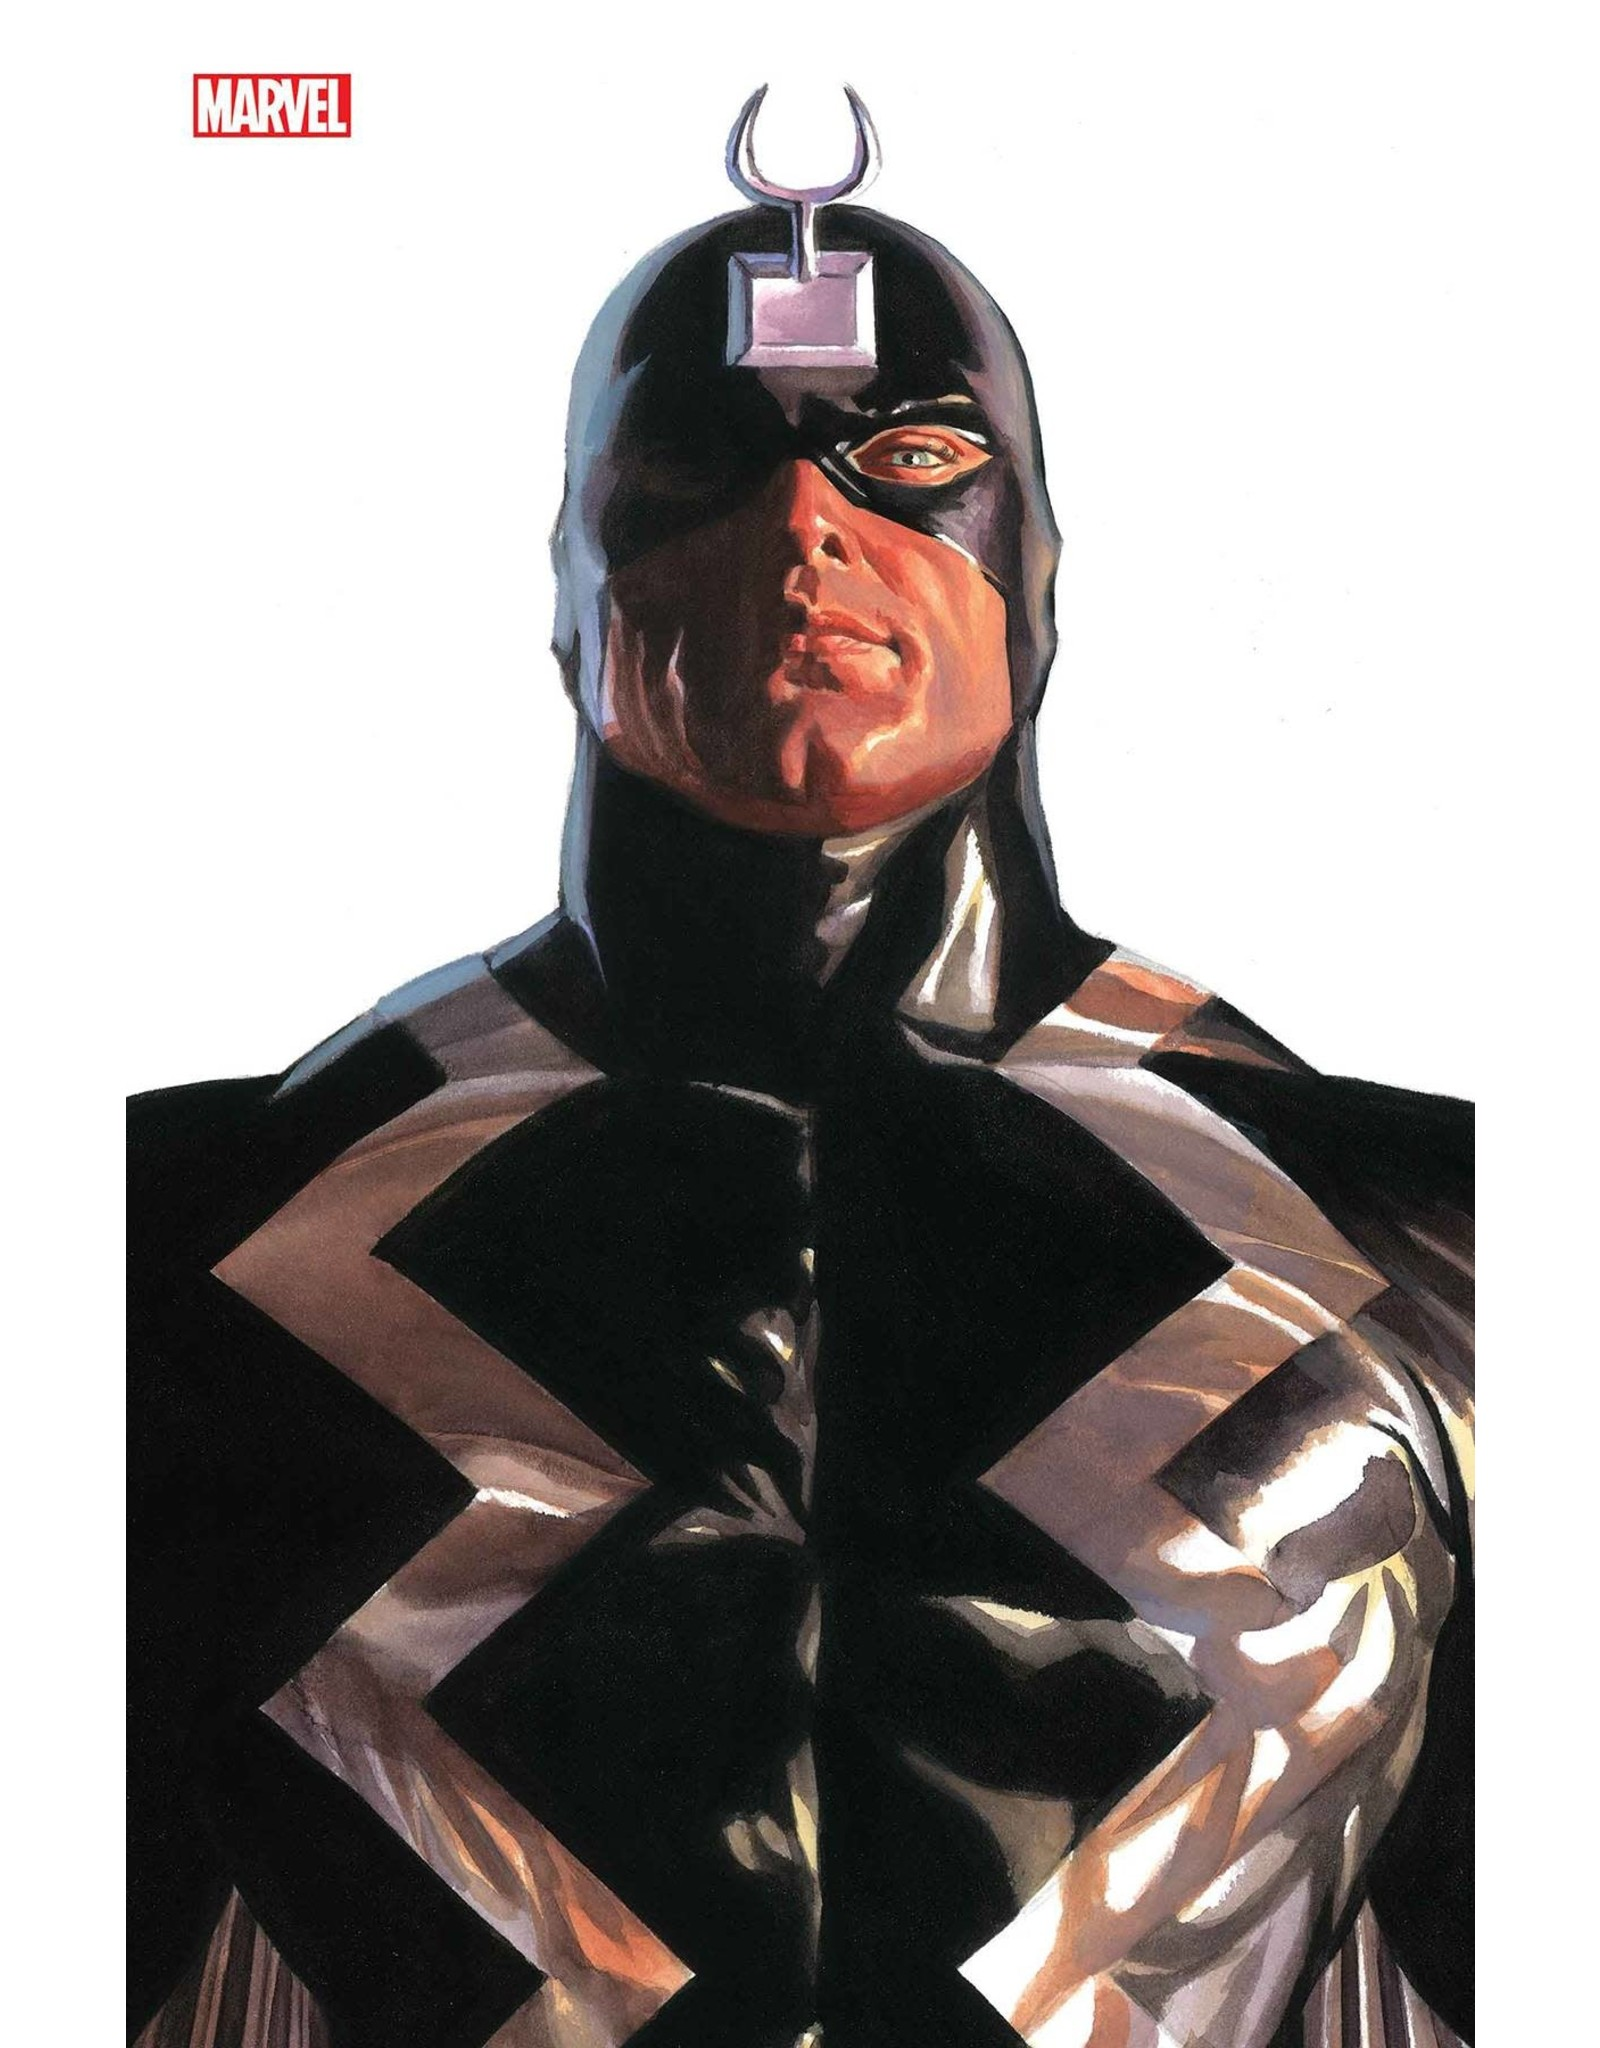 Marvel Comics FANTASTIC FOUR #25 ALEX ROSS BLACK BOLT TIMELESS VAR EMP